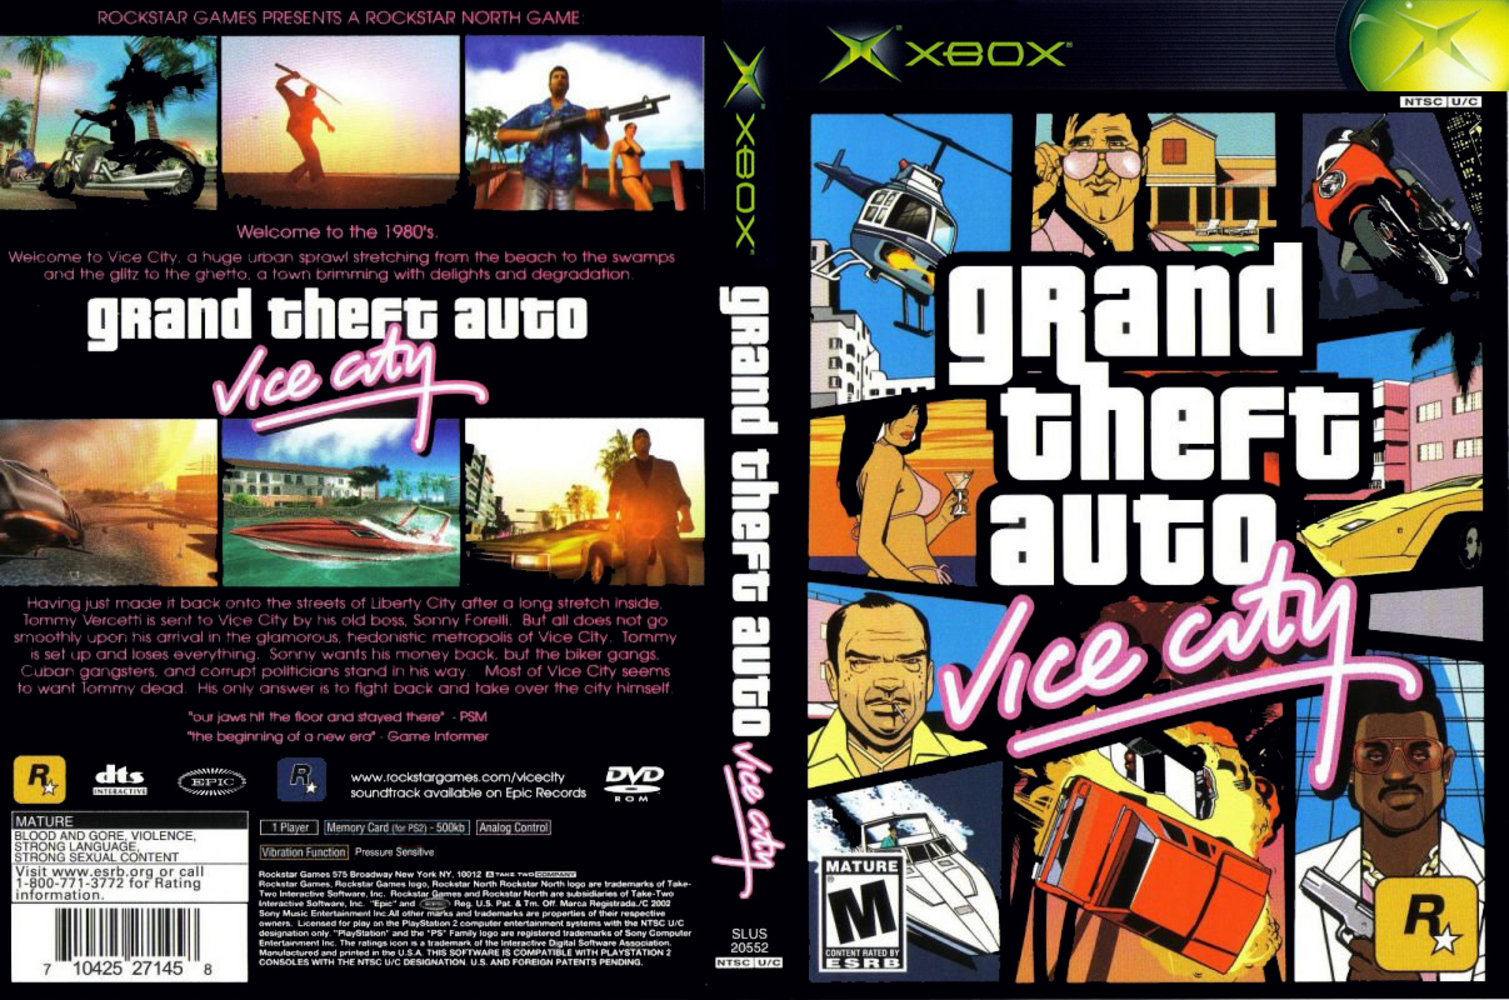 grand thert auto 3 xbox коды: